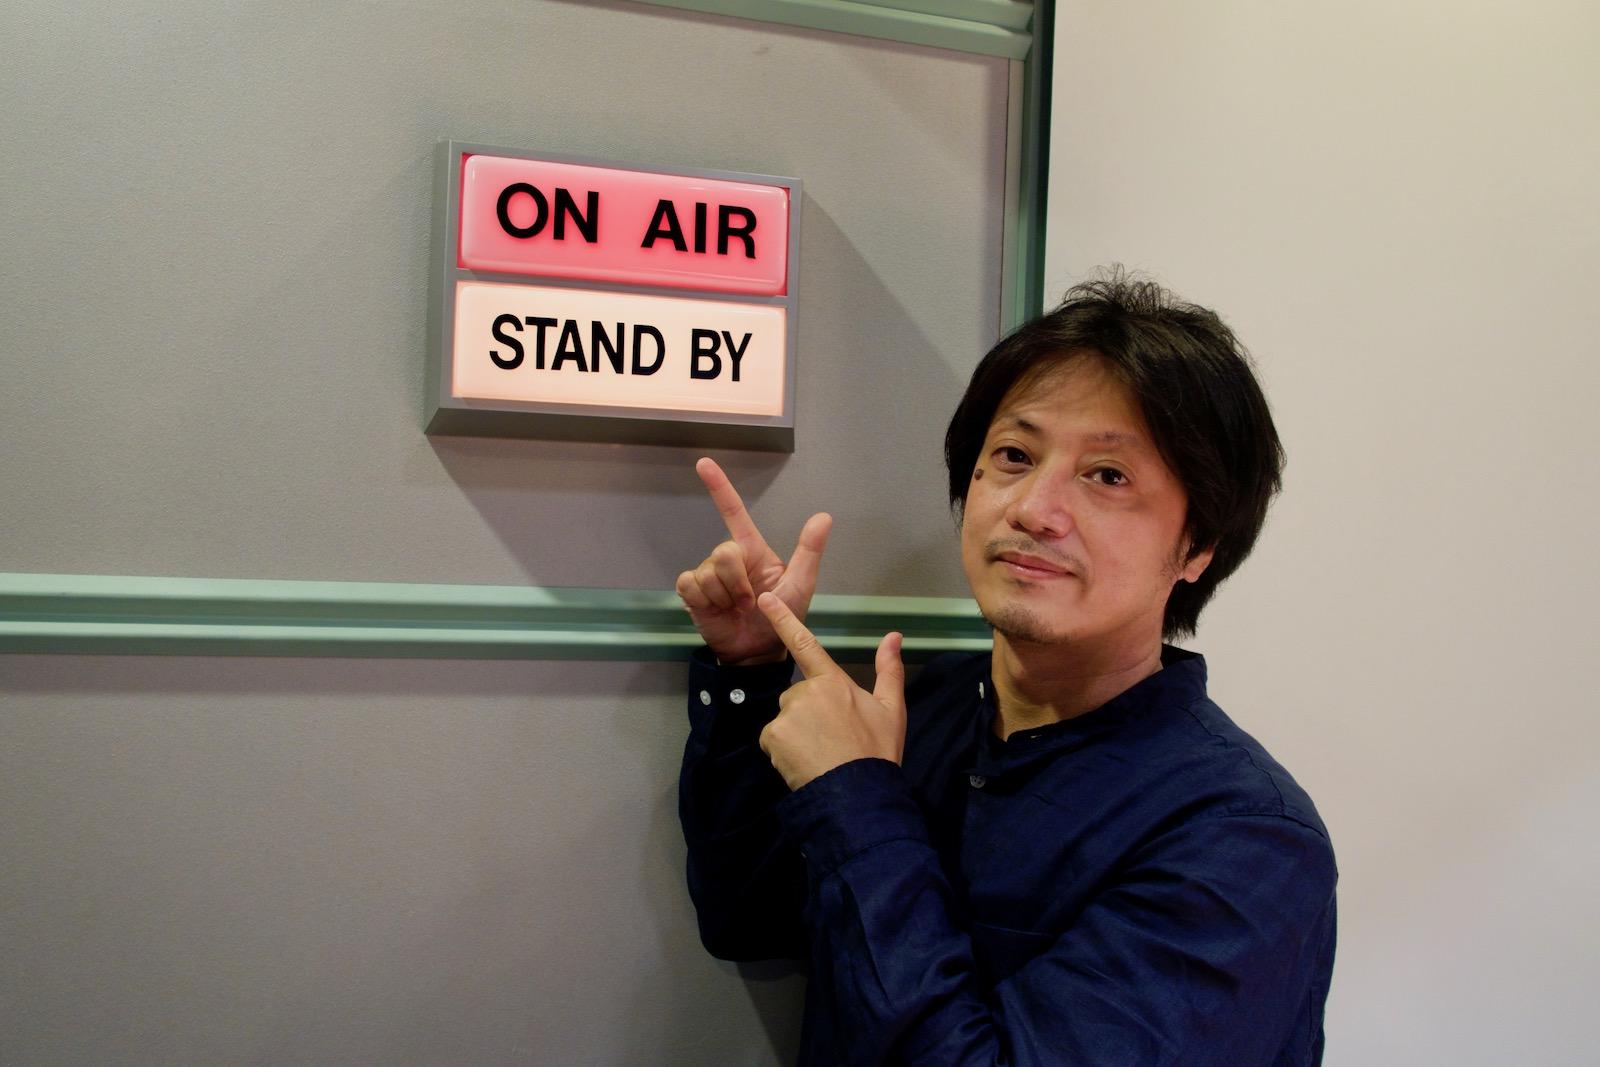 【radikoタイムフリー】ライター、編集者の九龍ジョー(くーろん・じょー)さん!自身のルーツを語る。